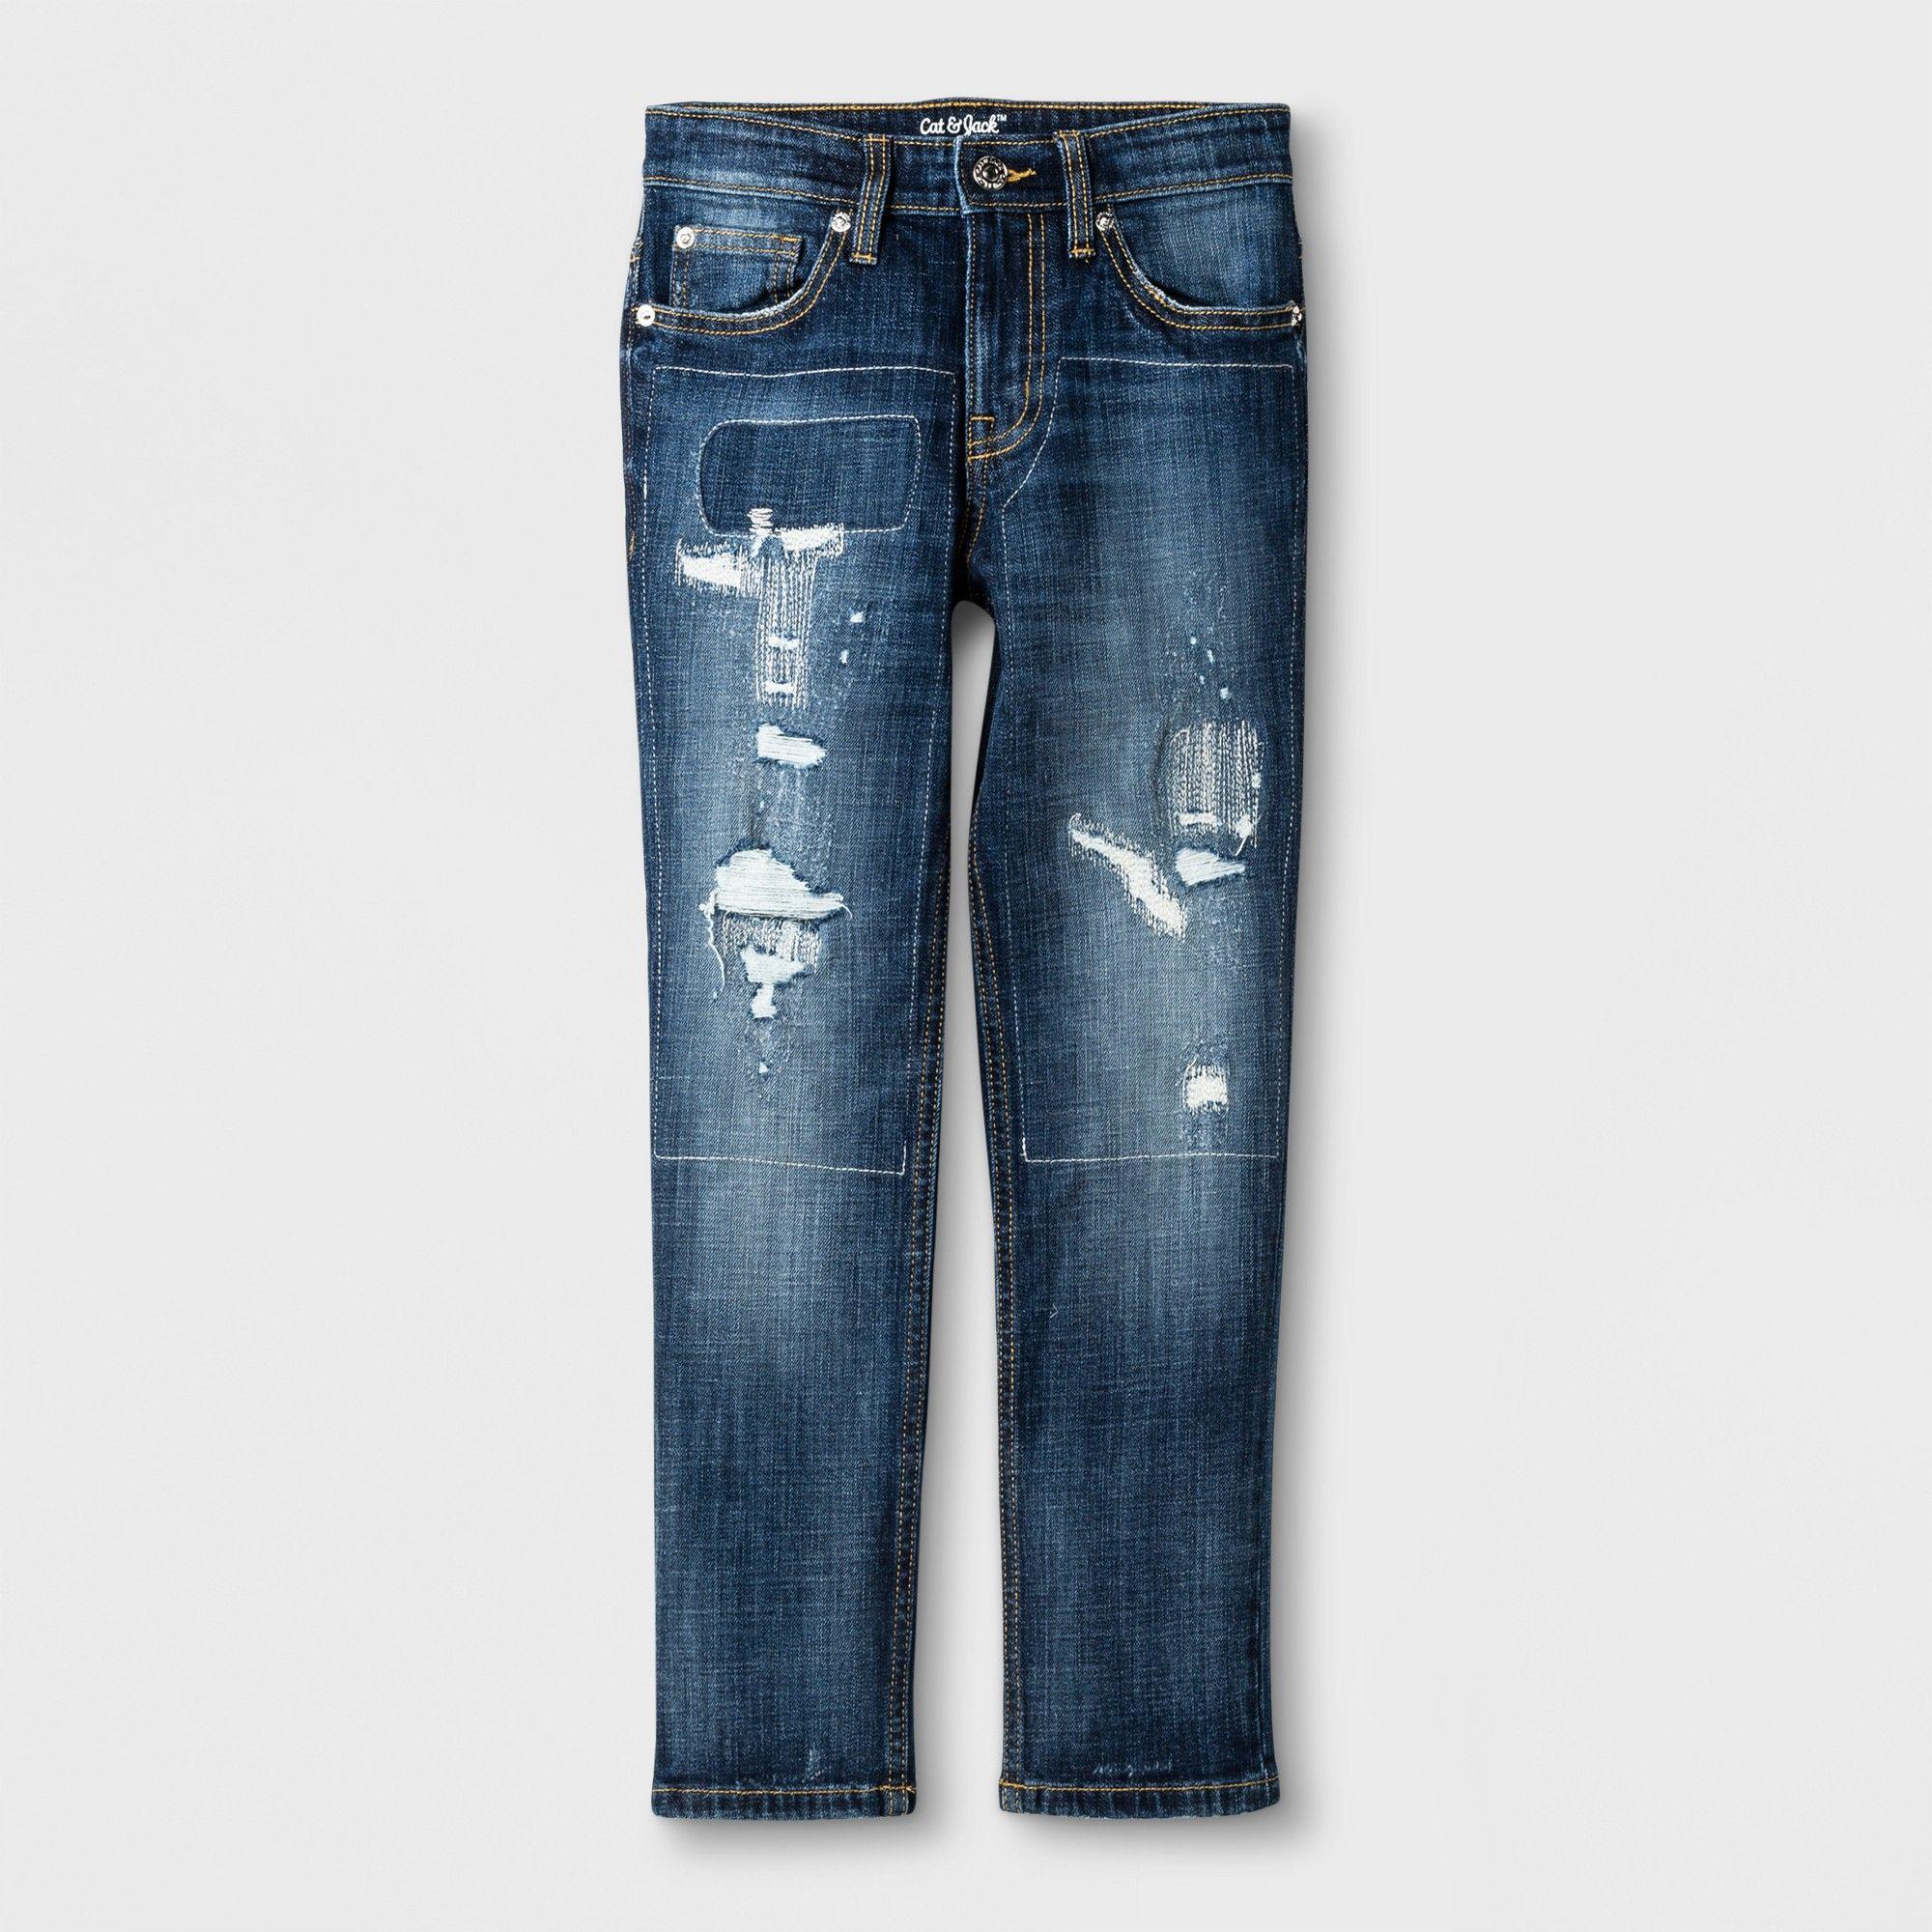 a54298351 Boys' Athleisure Taper Pants - Cat & Jack Dark Blue 6, Size: 14 ...